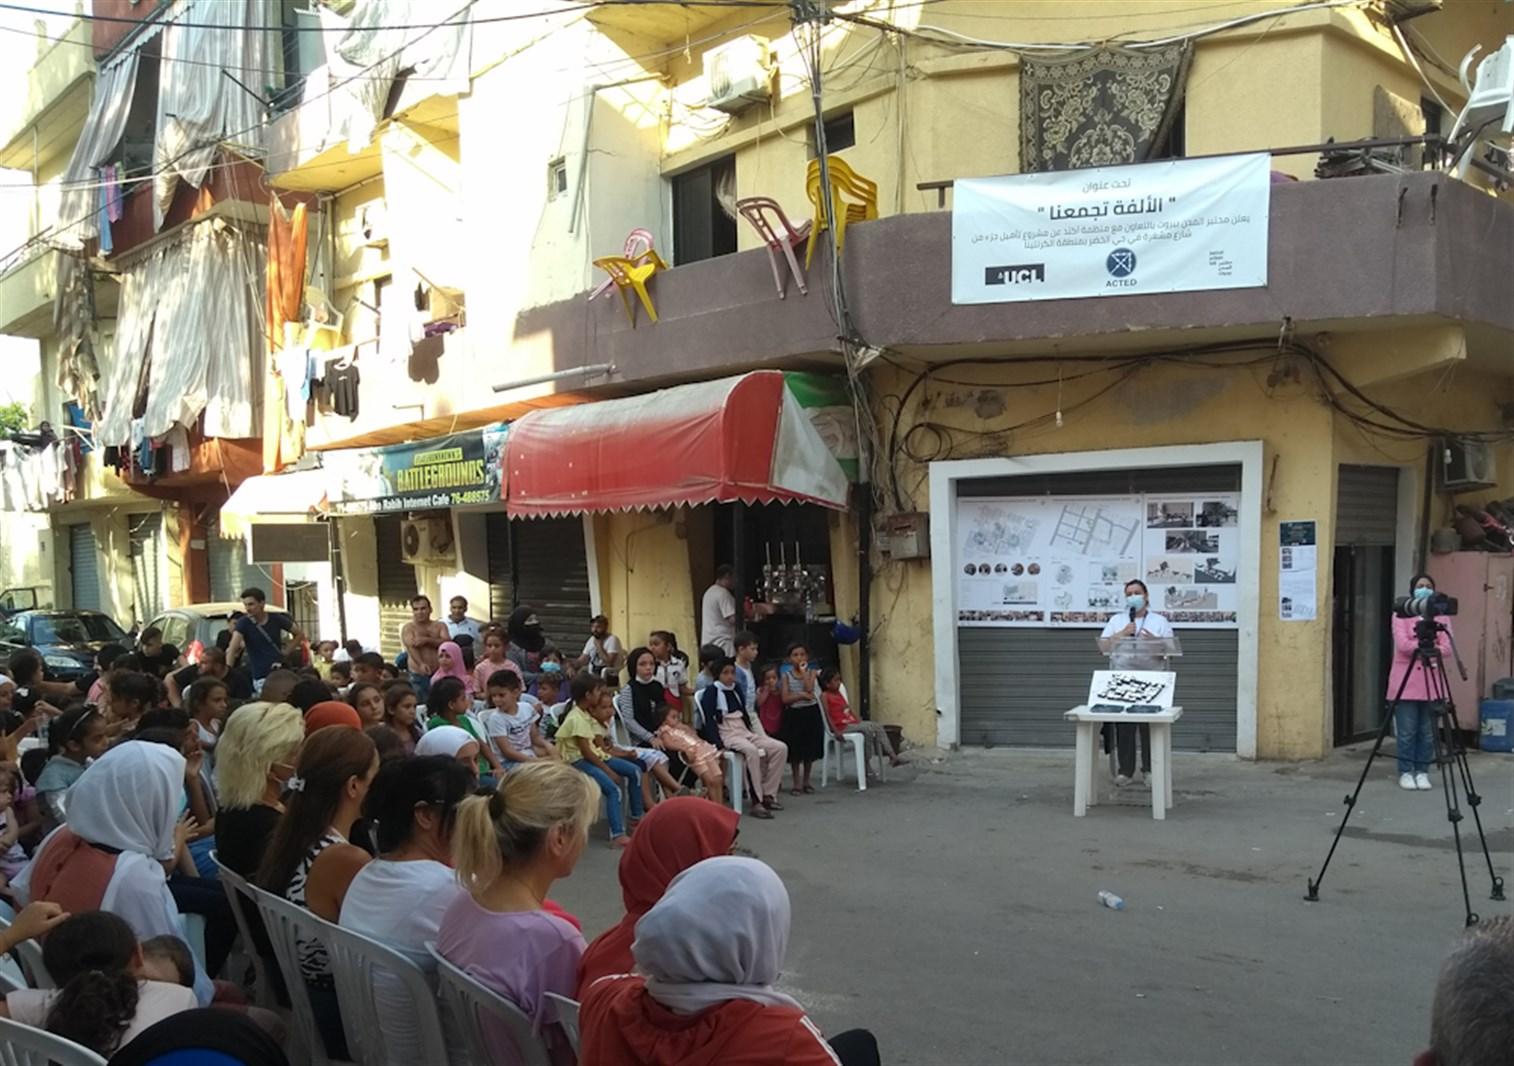 Launching of the Rehabilitation Project of Sahet Al Khodor in Karantina